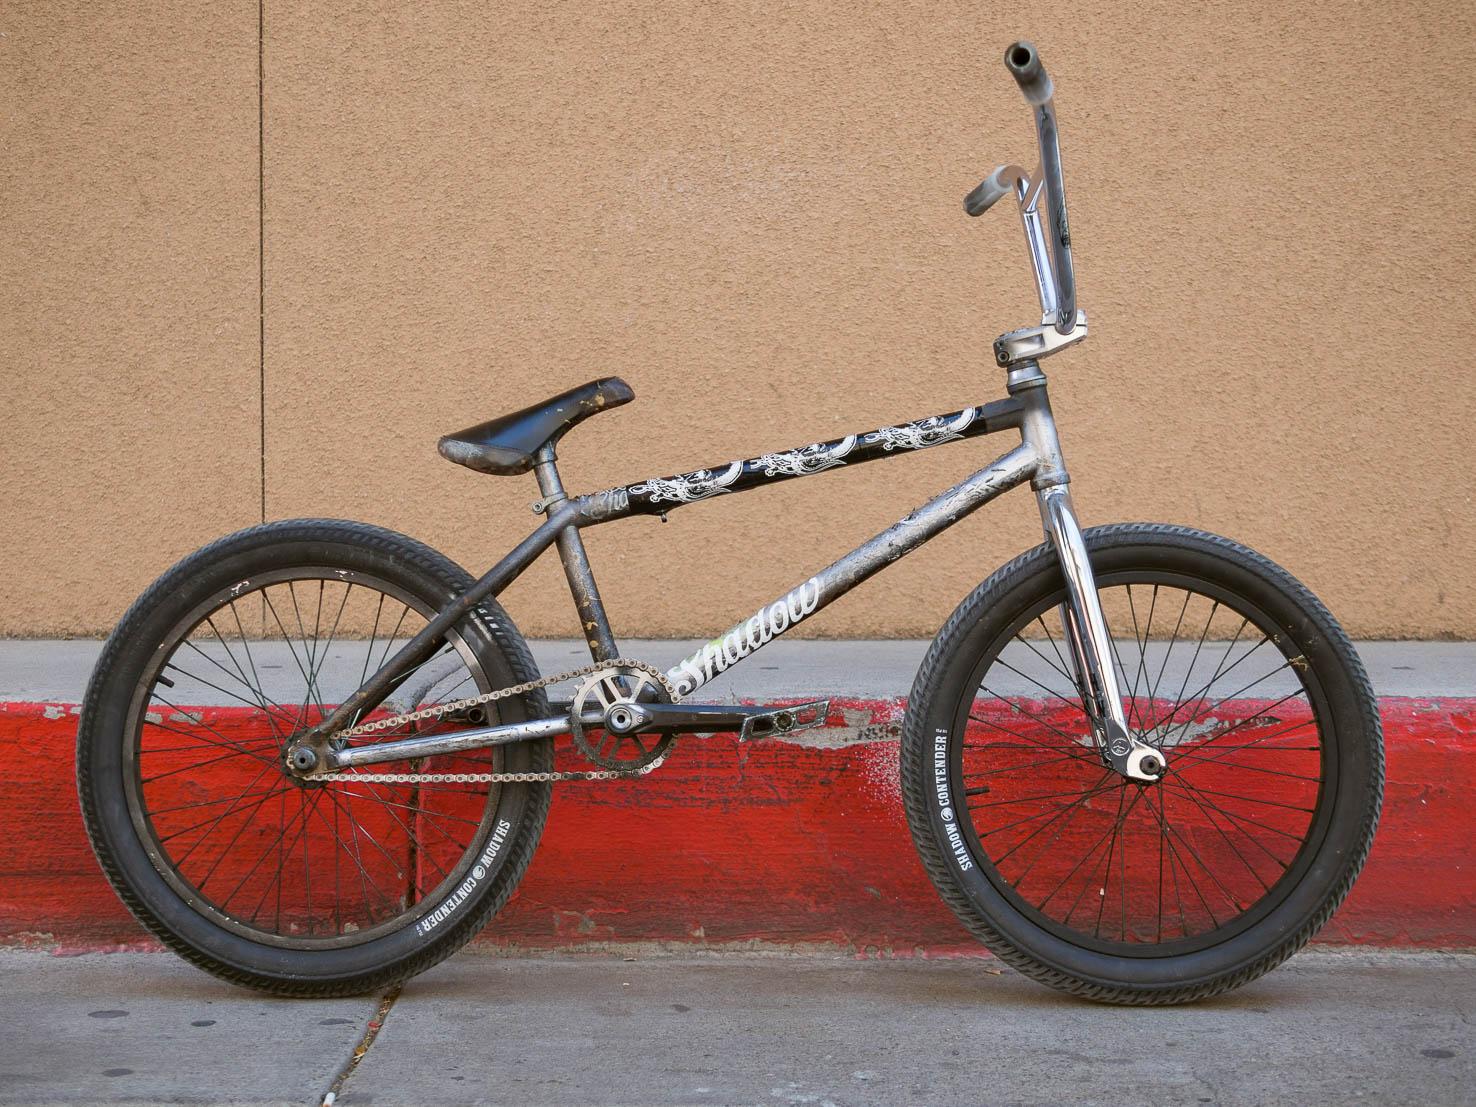 Trey Jones - Bike Check